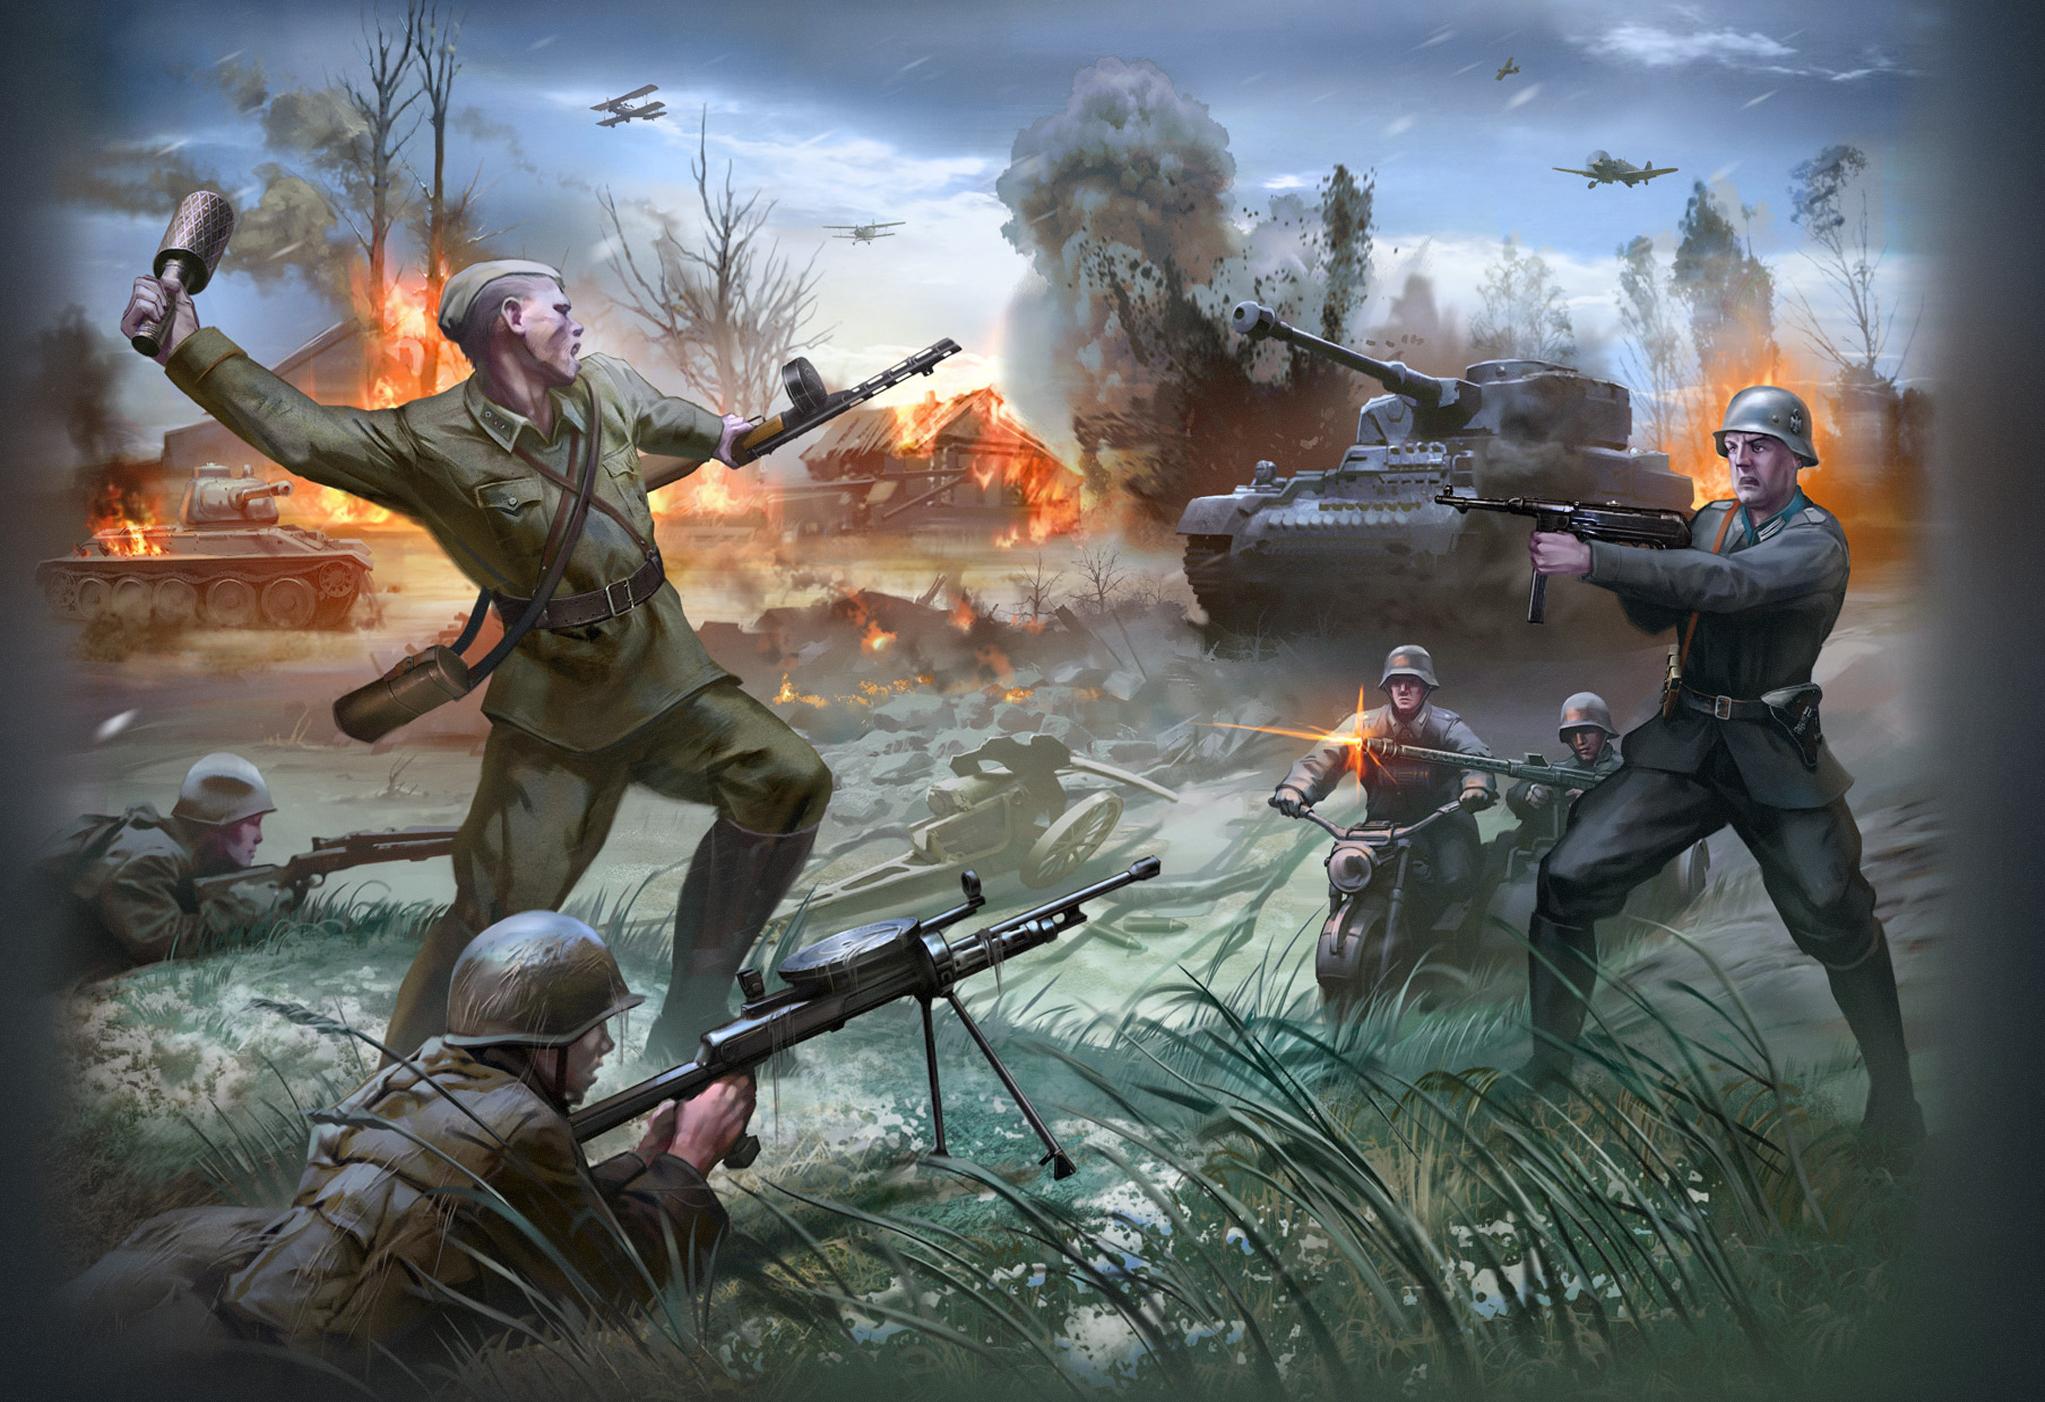 ww2 german army wallpaper - photo #4